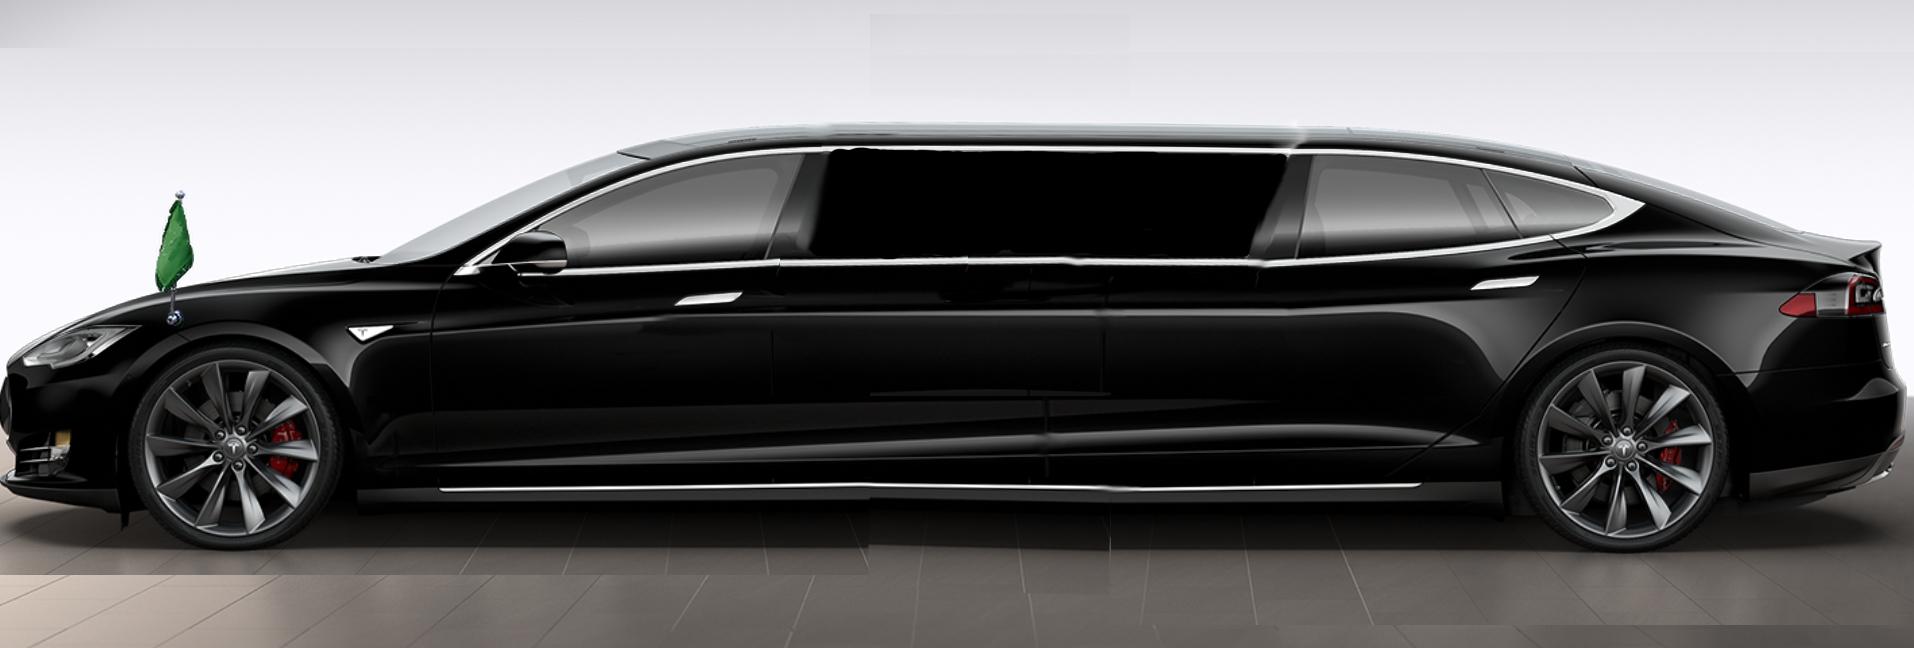 Tesla Model S P85D LIMO.jpg